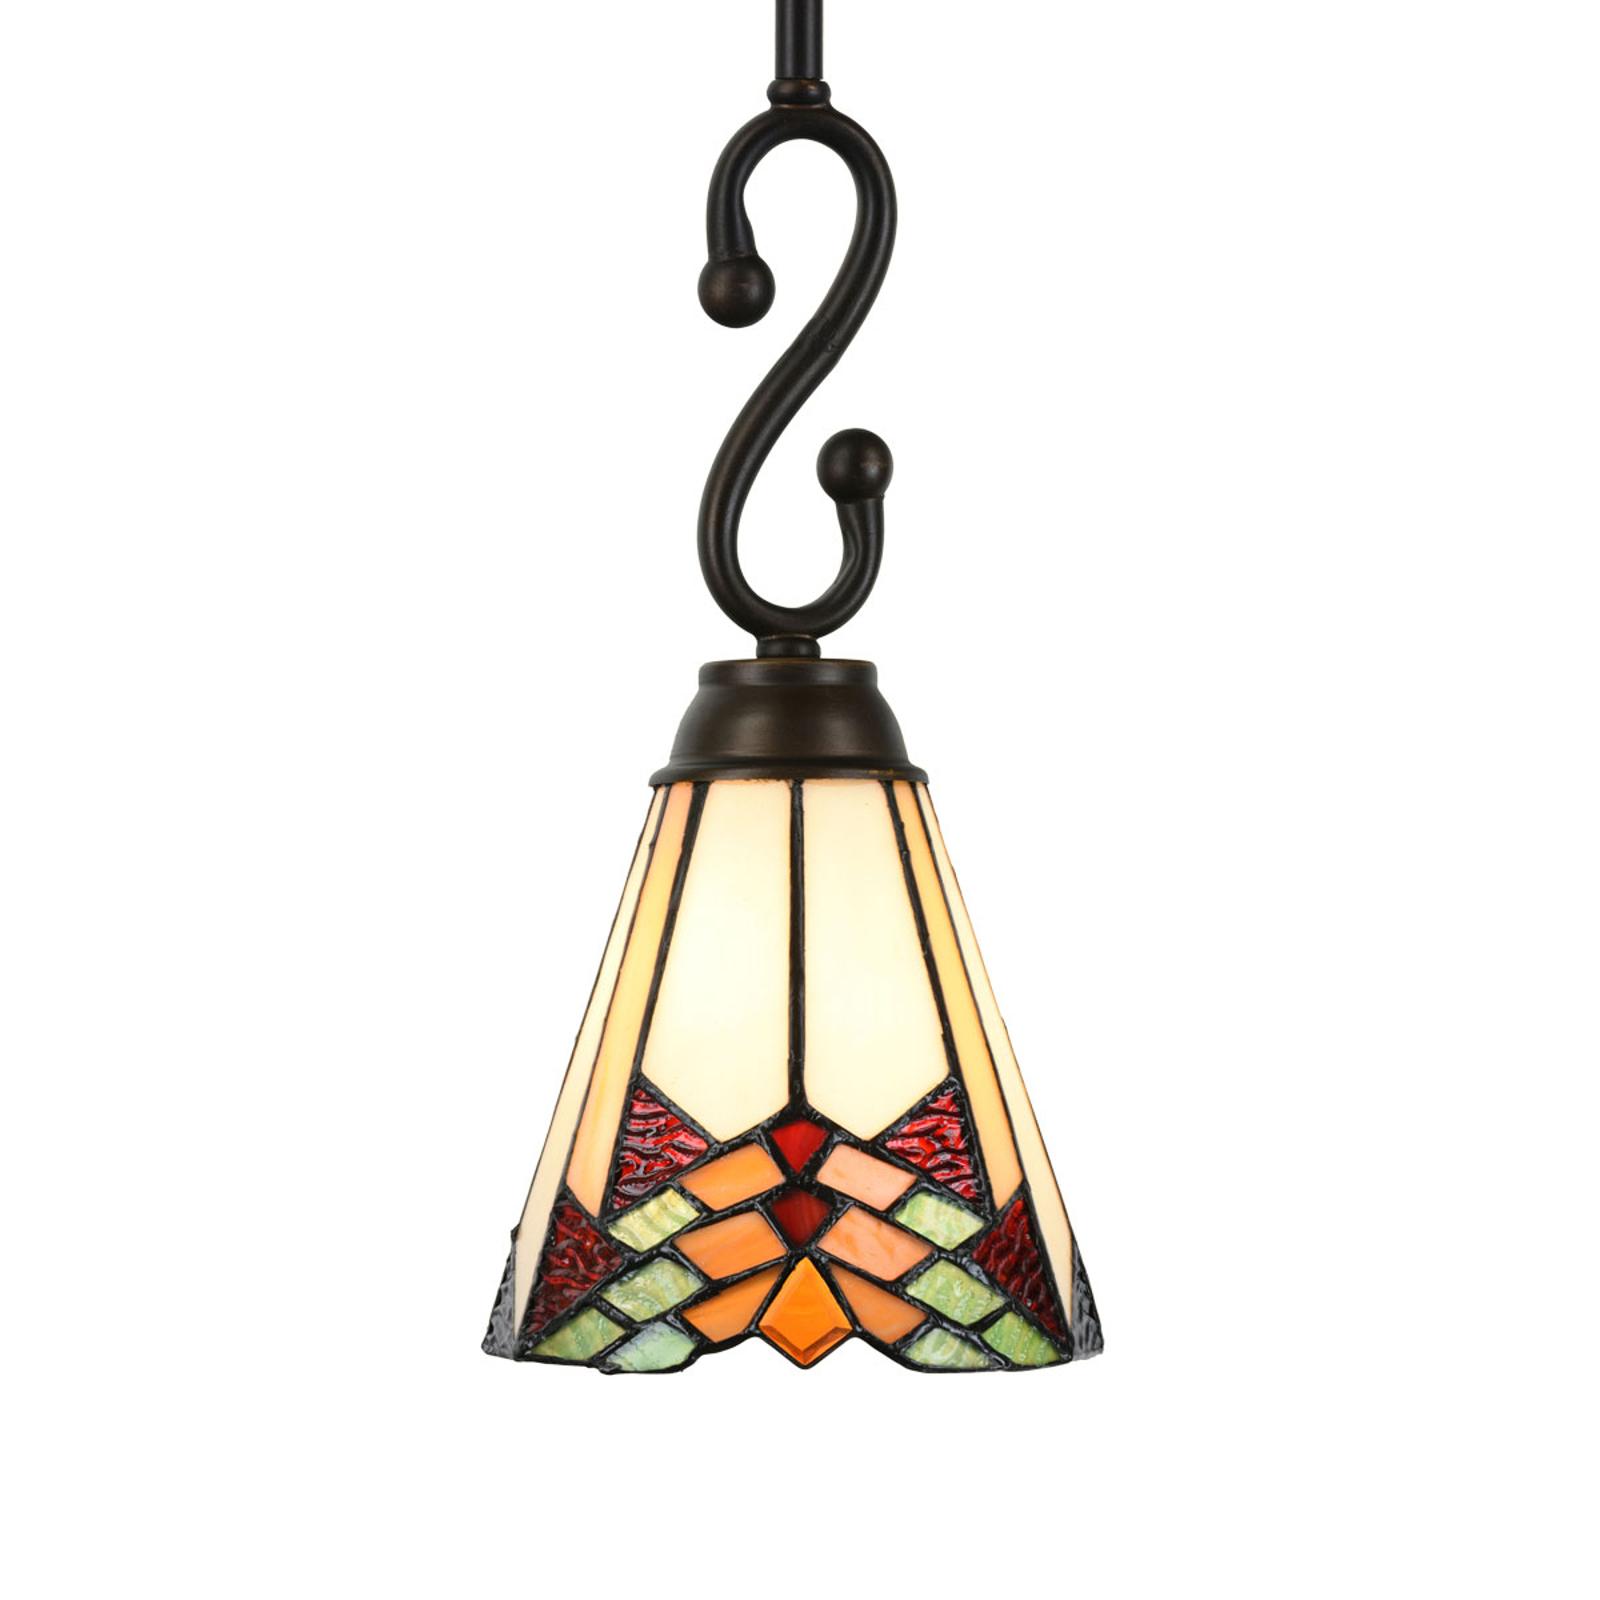 Suspension 5965 au design Tiffany à 1 lampe